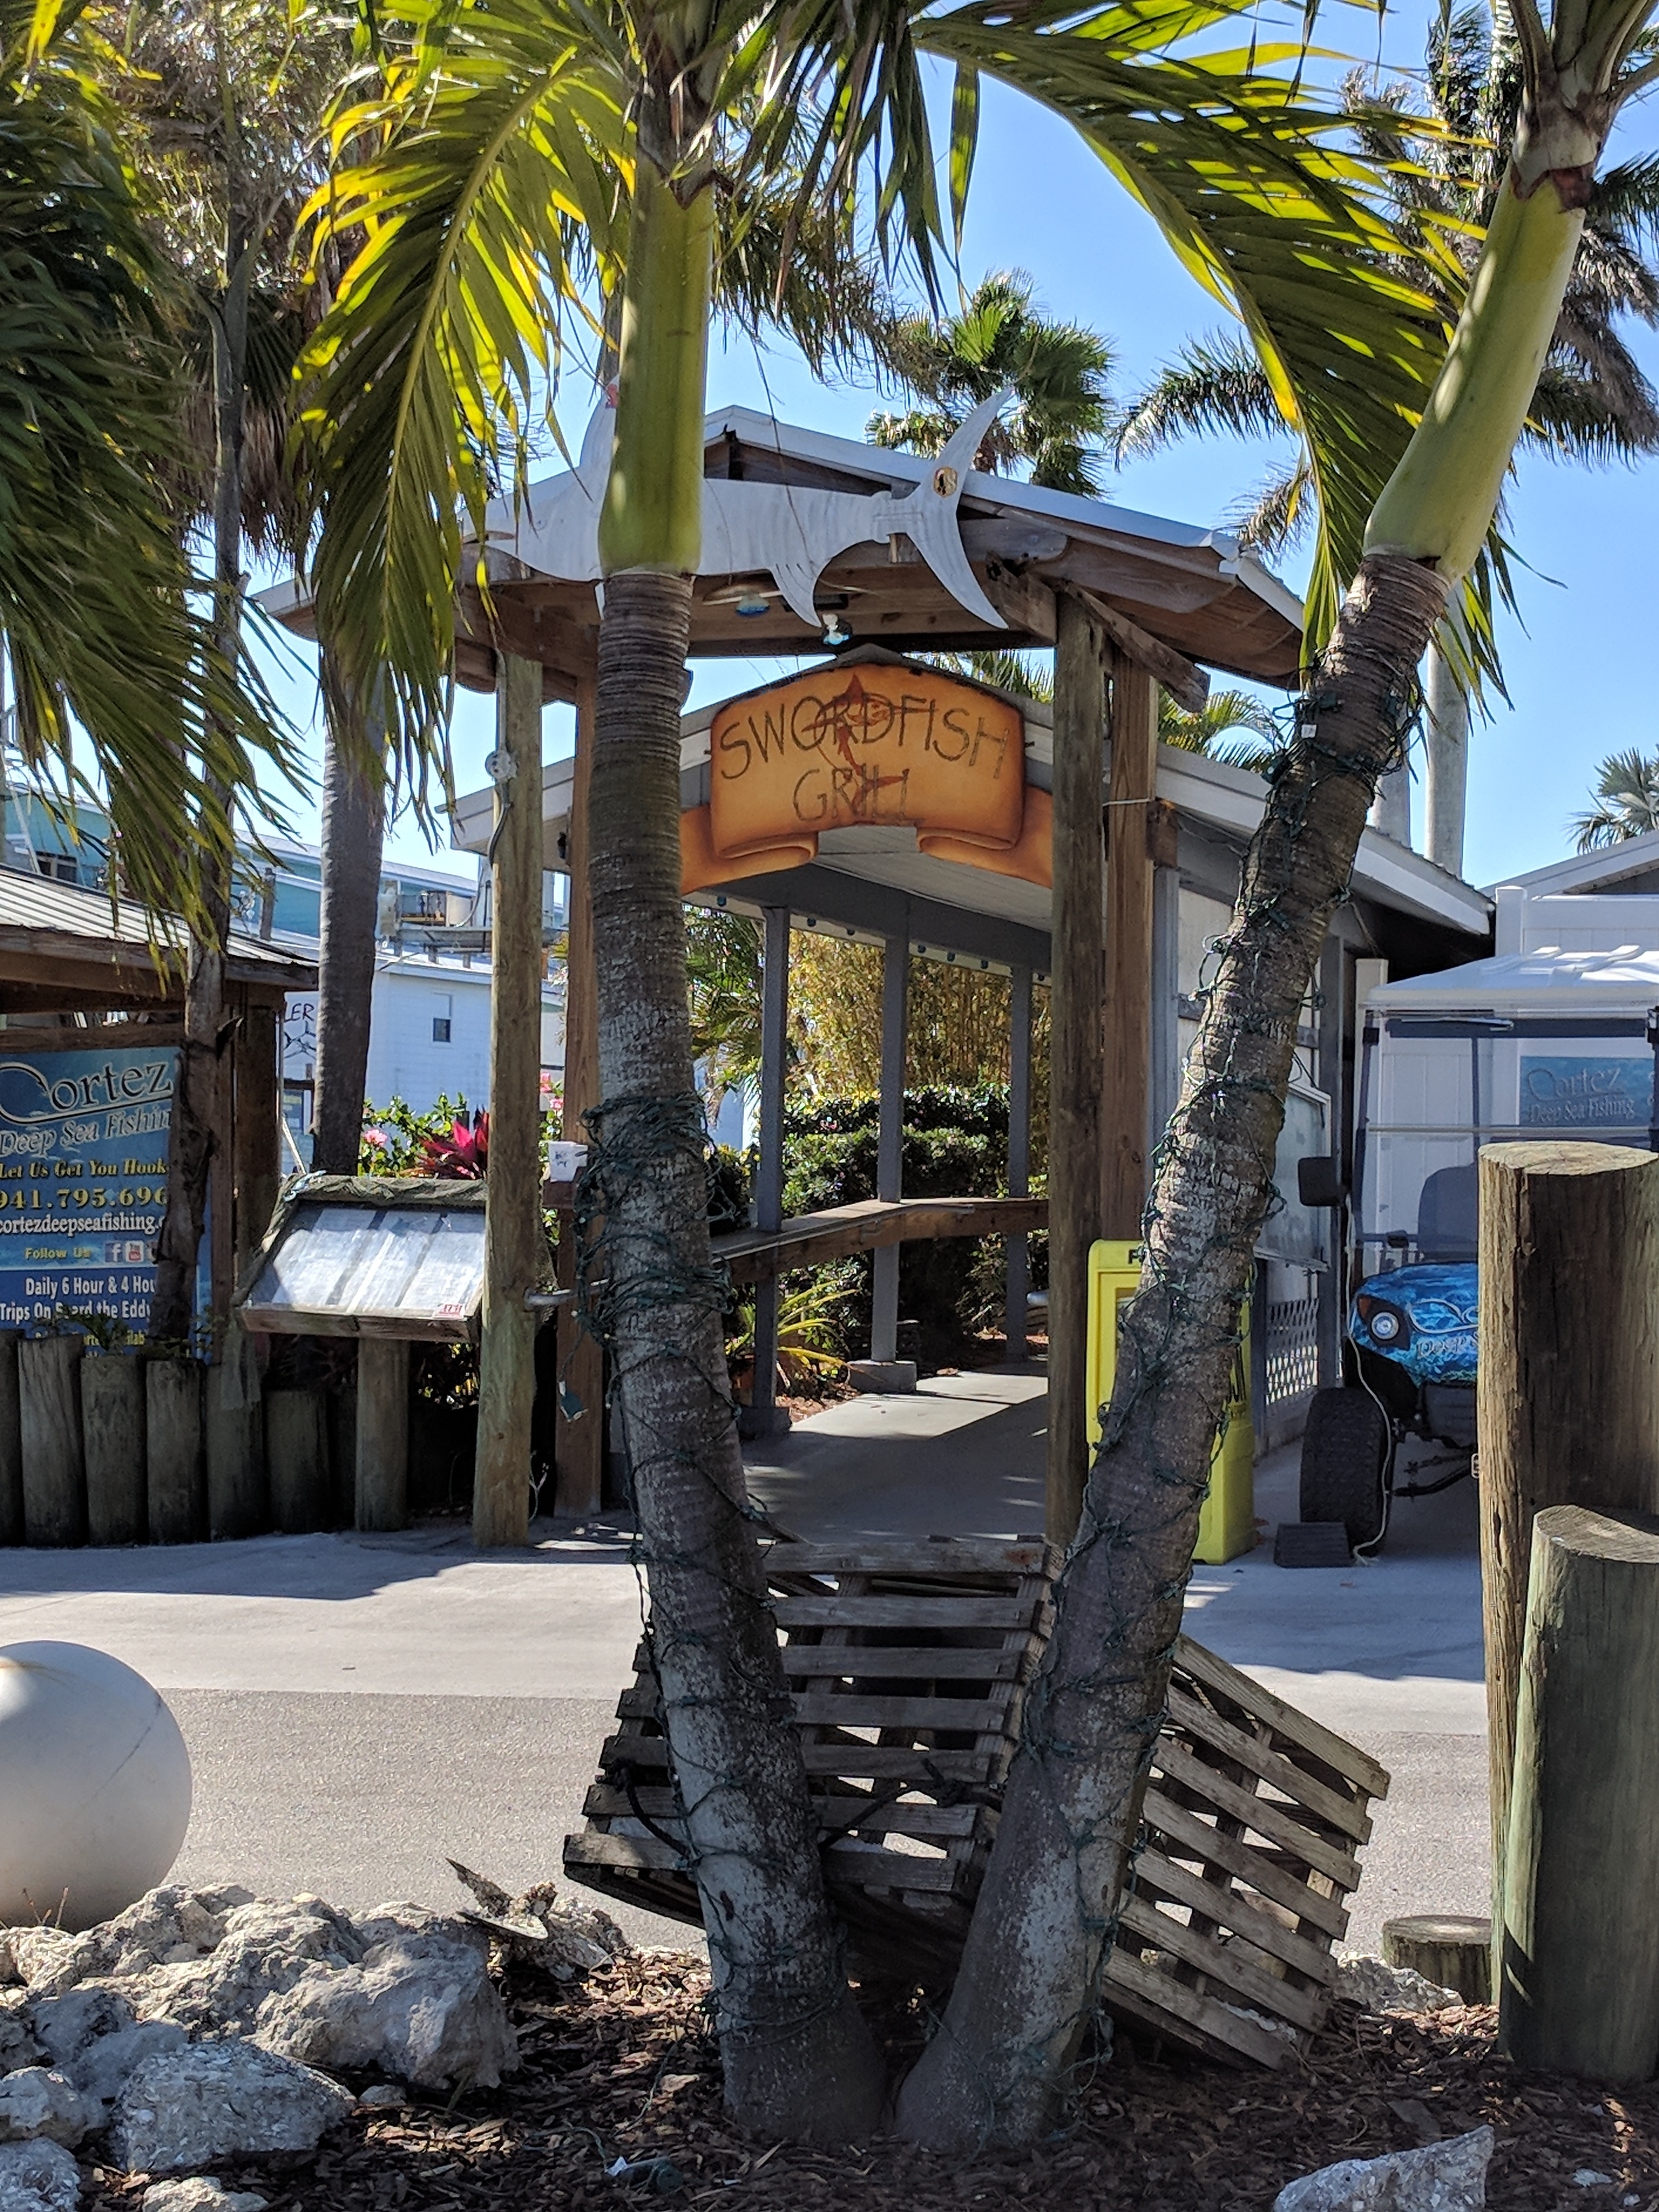 Swordfish Grill Cortez, Florida